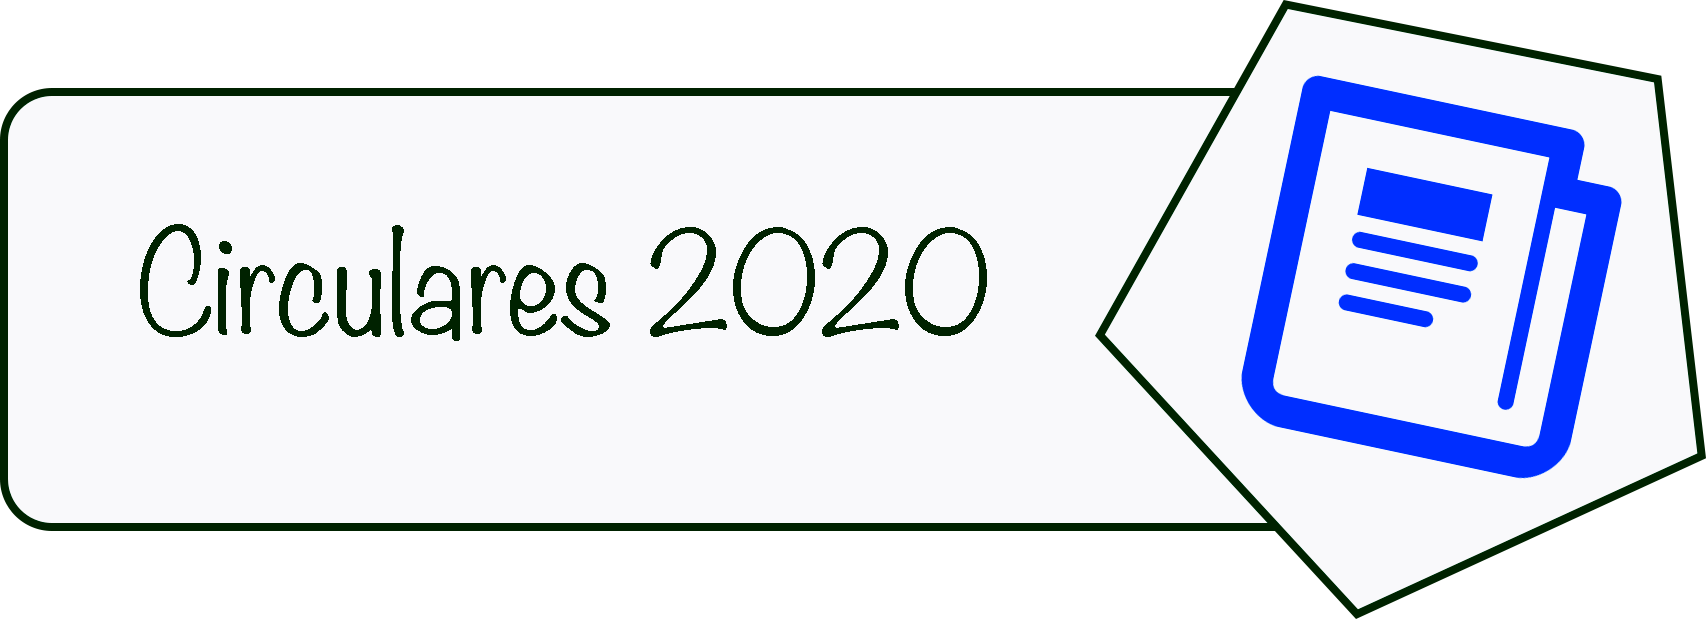 Circulares 2020